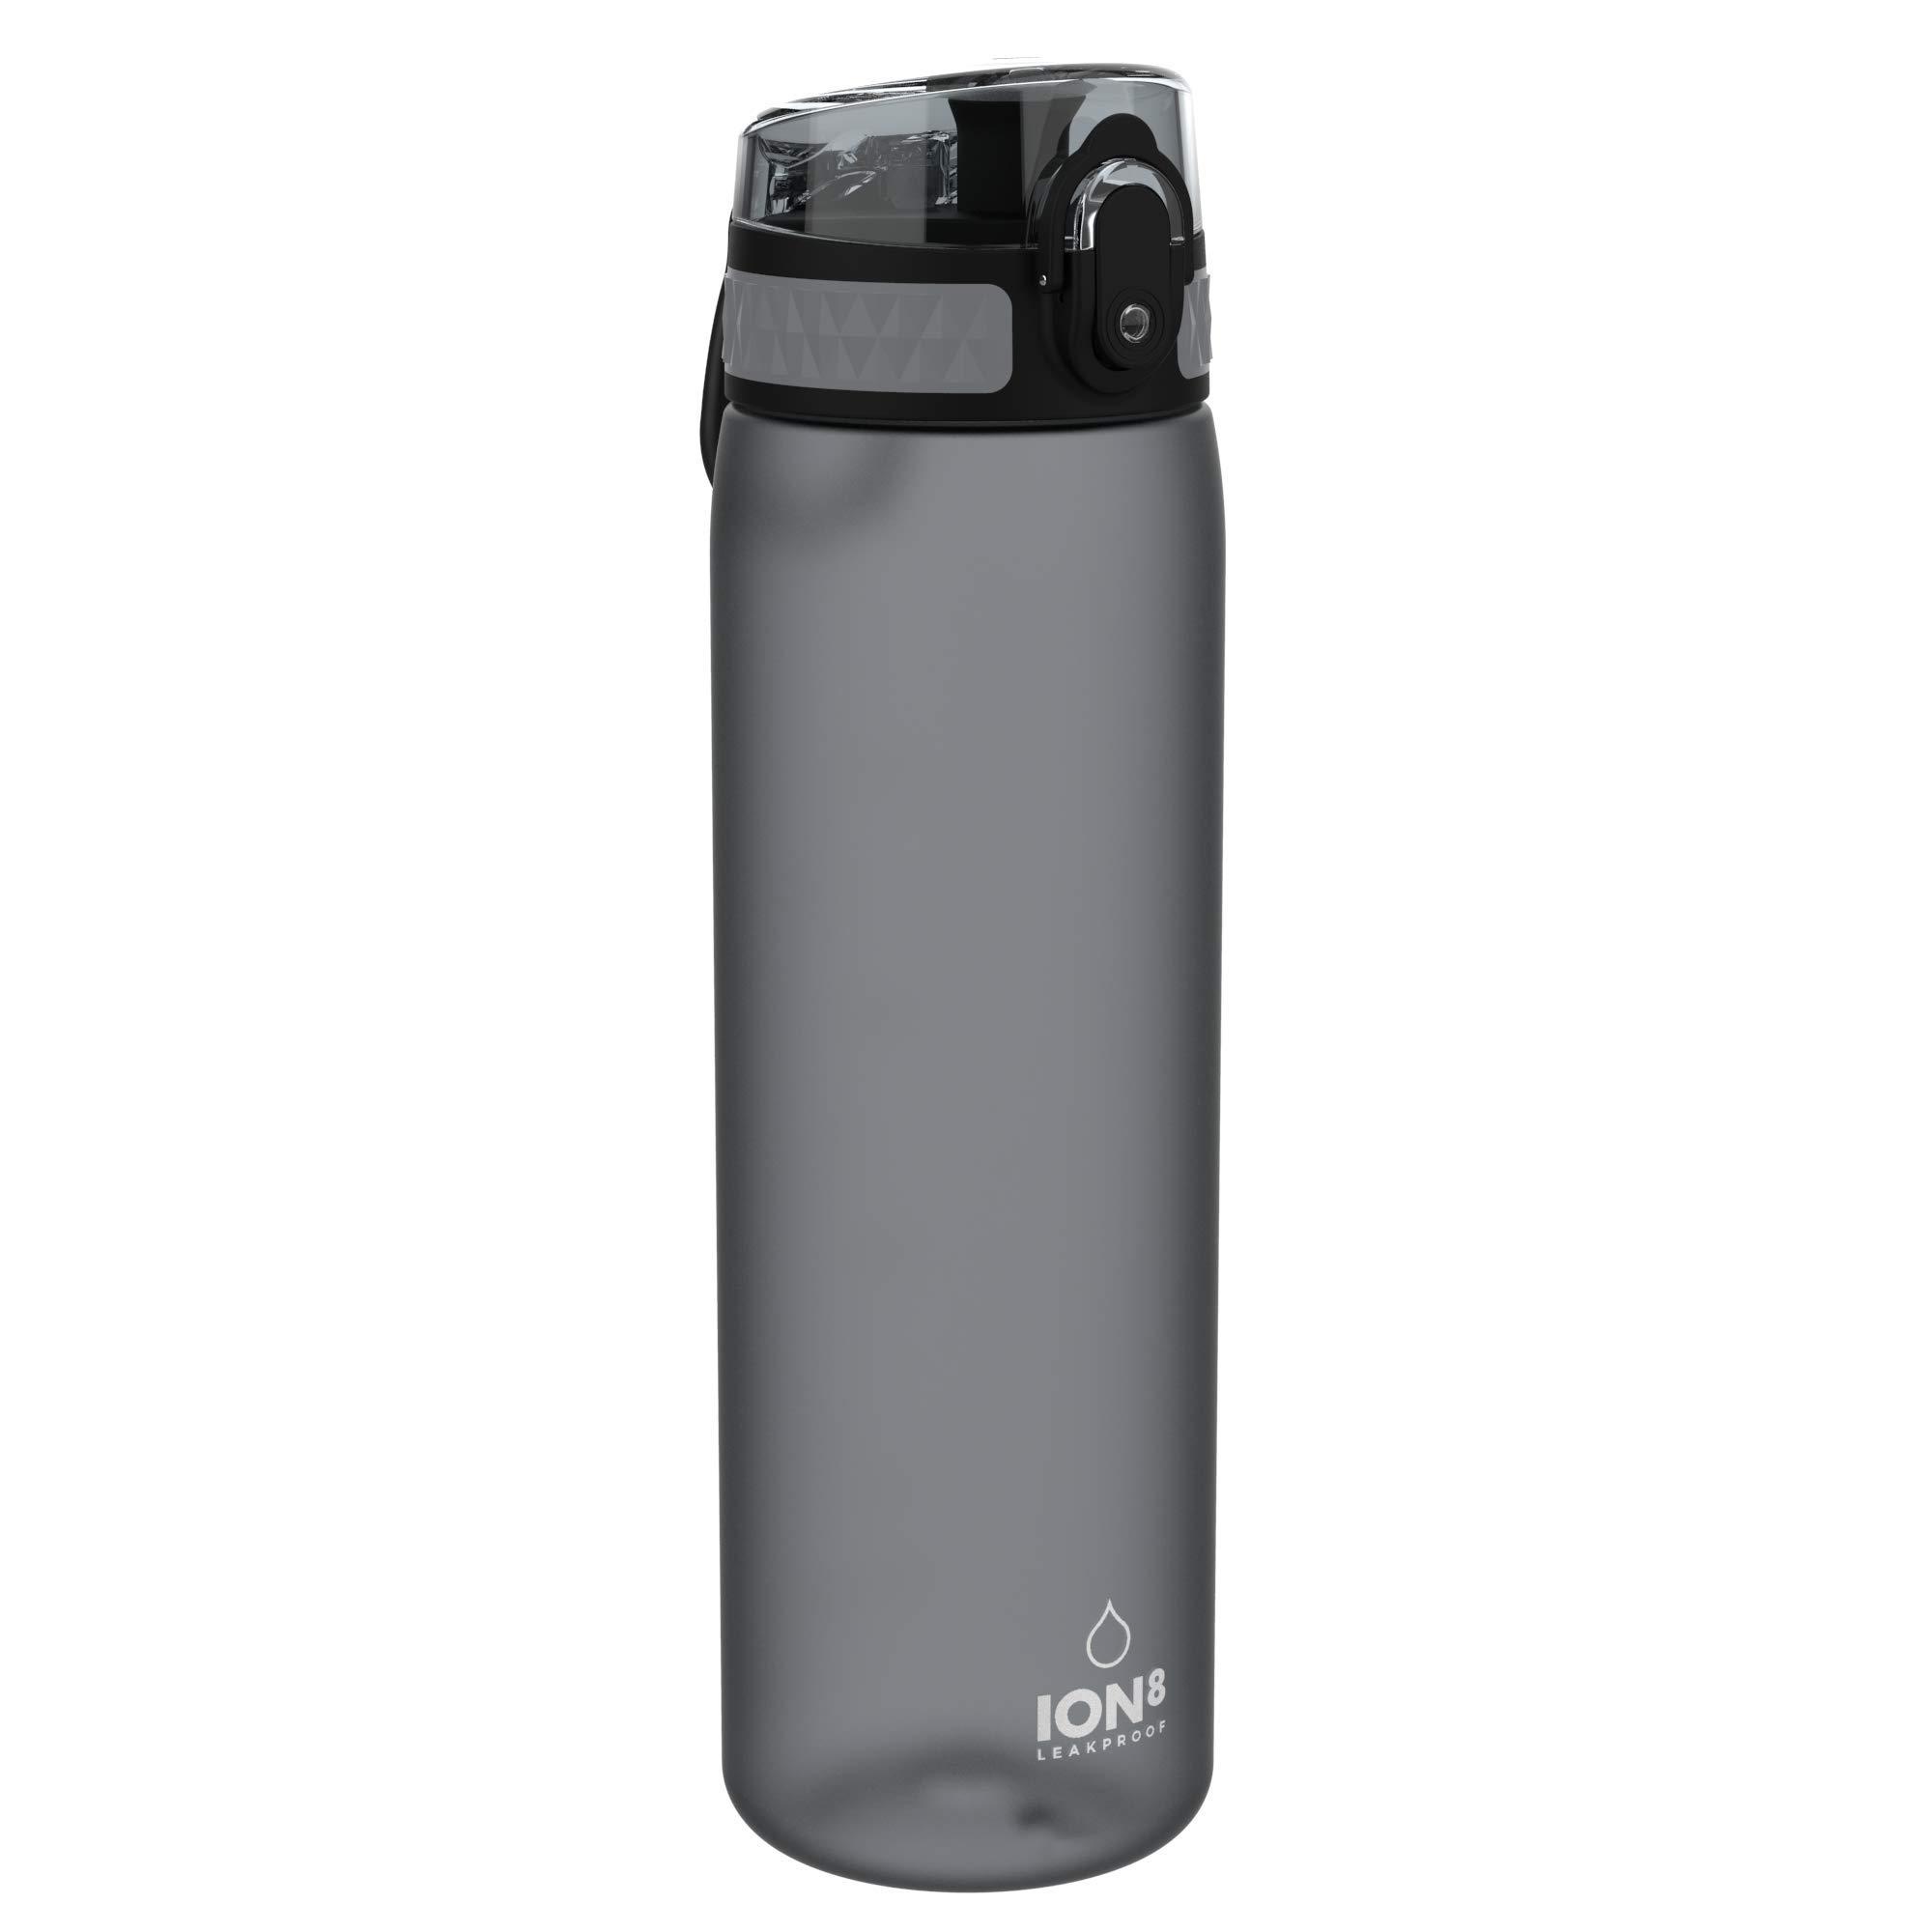 Ion8 Slim Leak Proof BPA Free Water Bottle